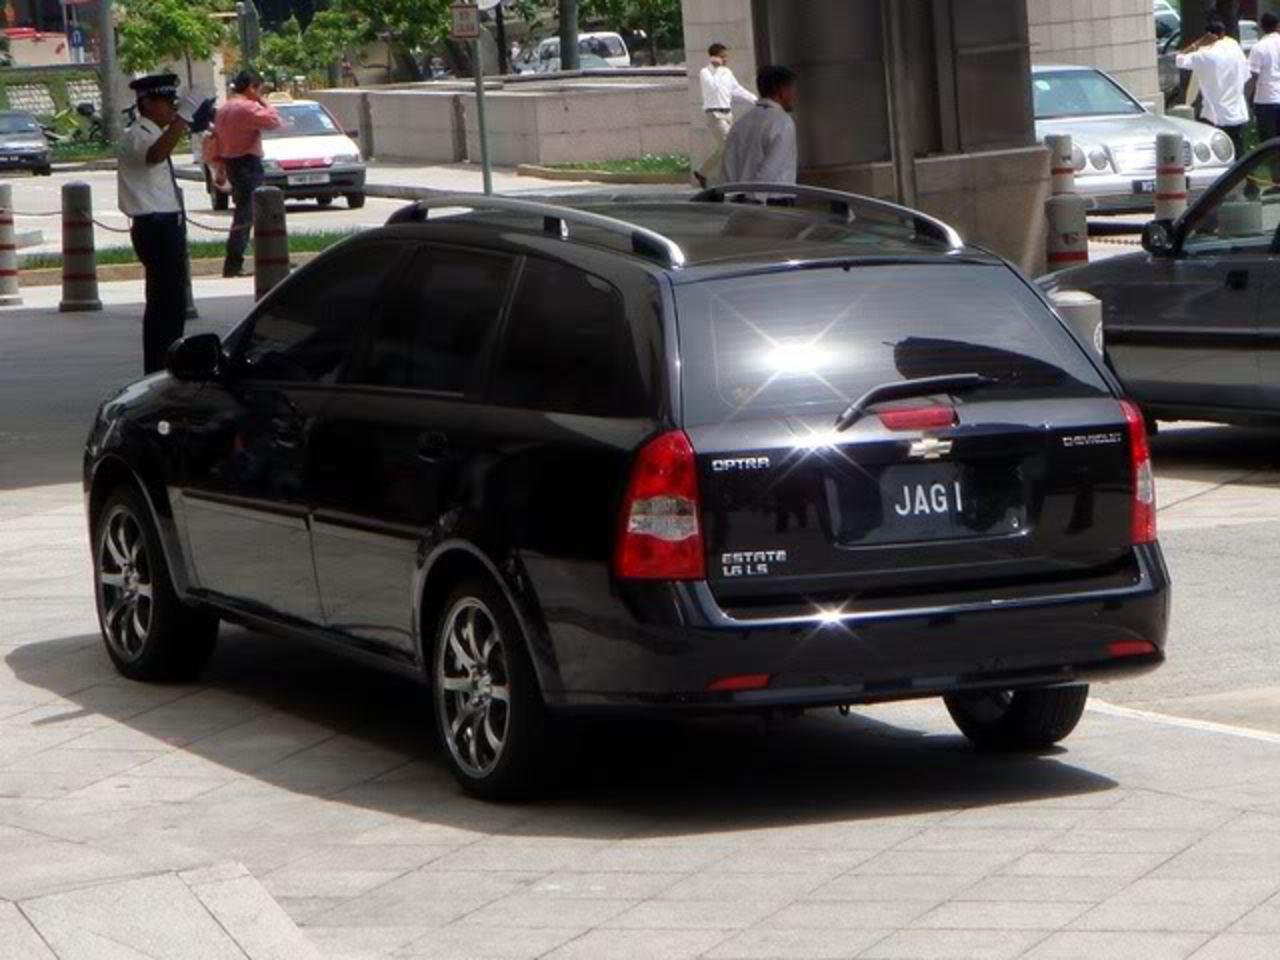 Chevrolet estate specs photos videos and more on topworldauto